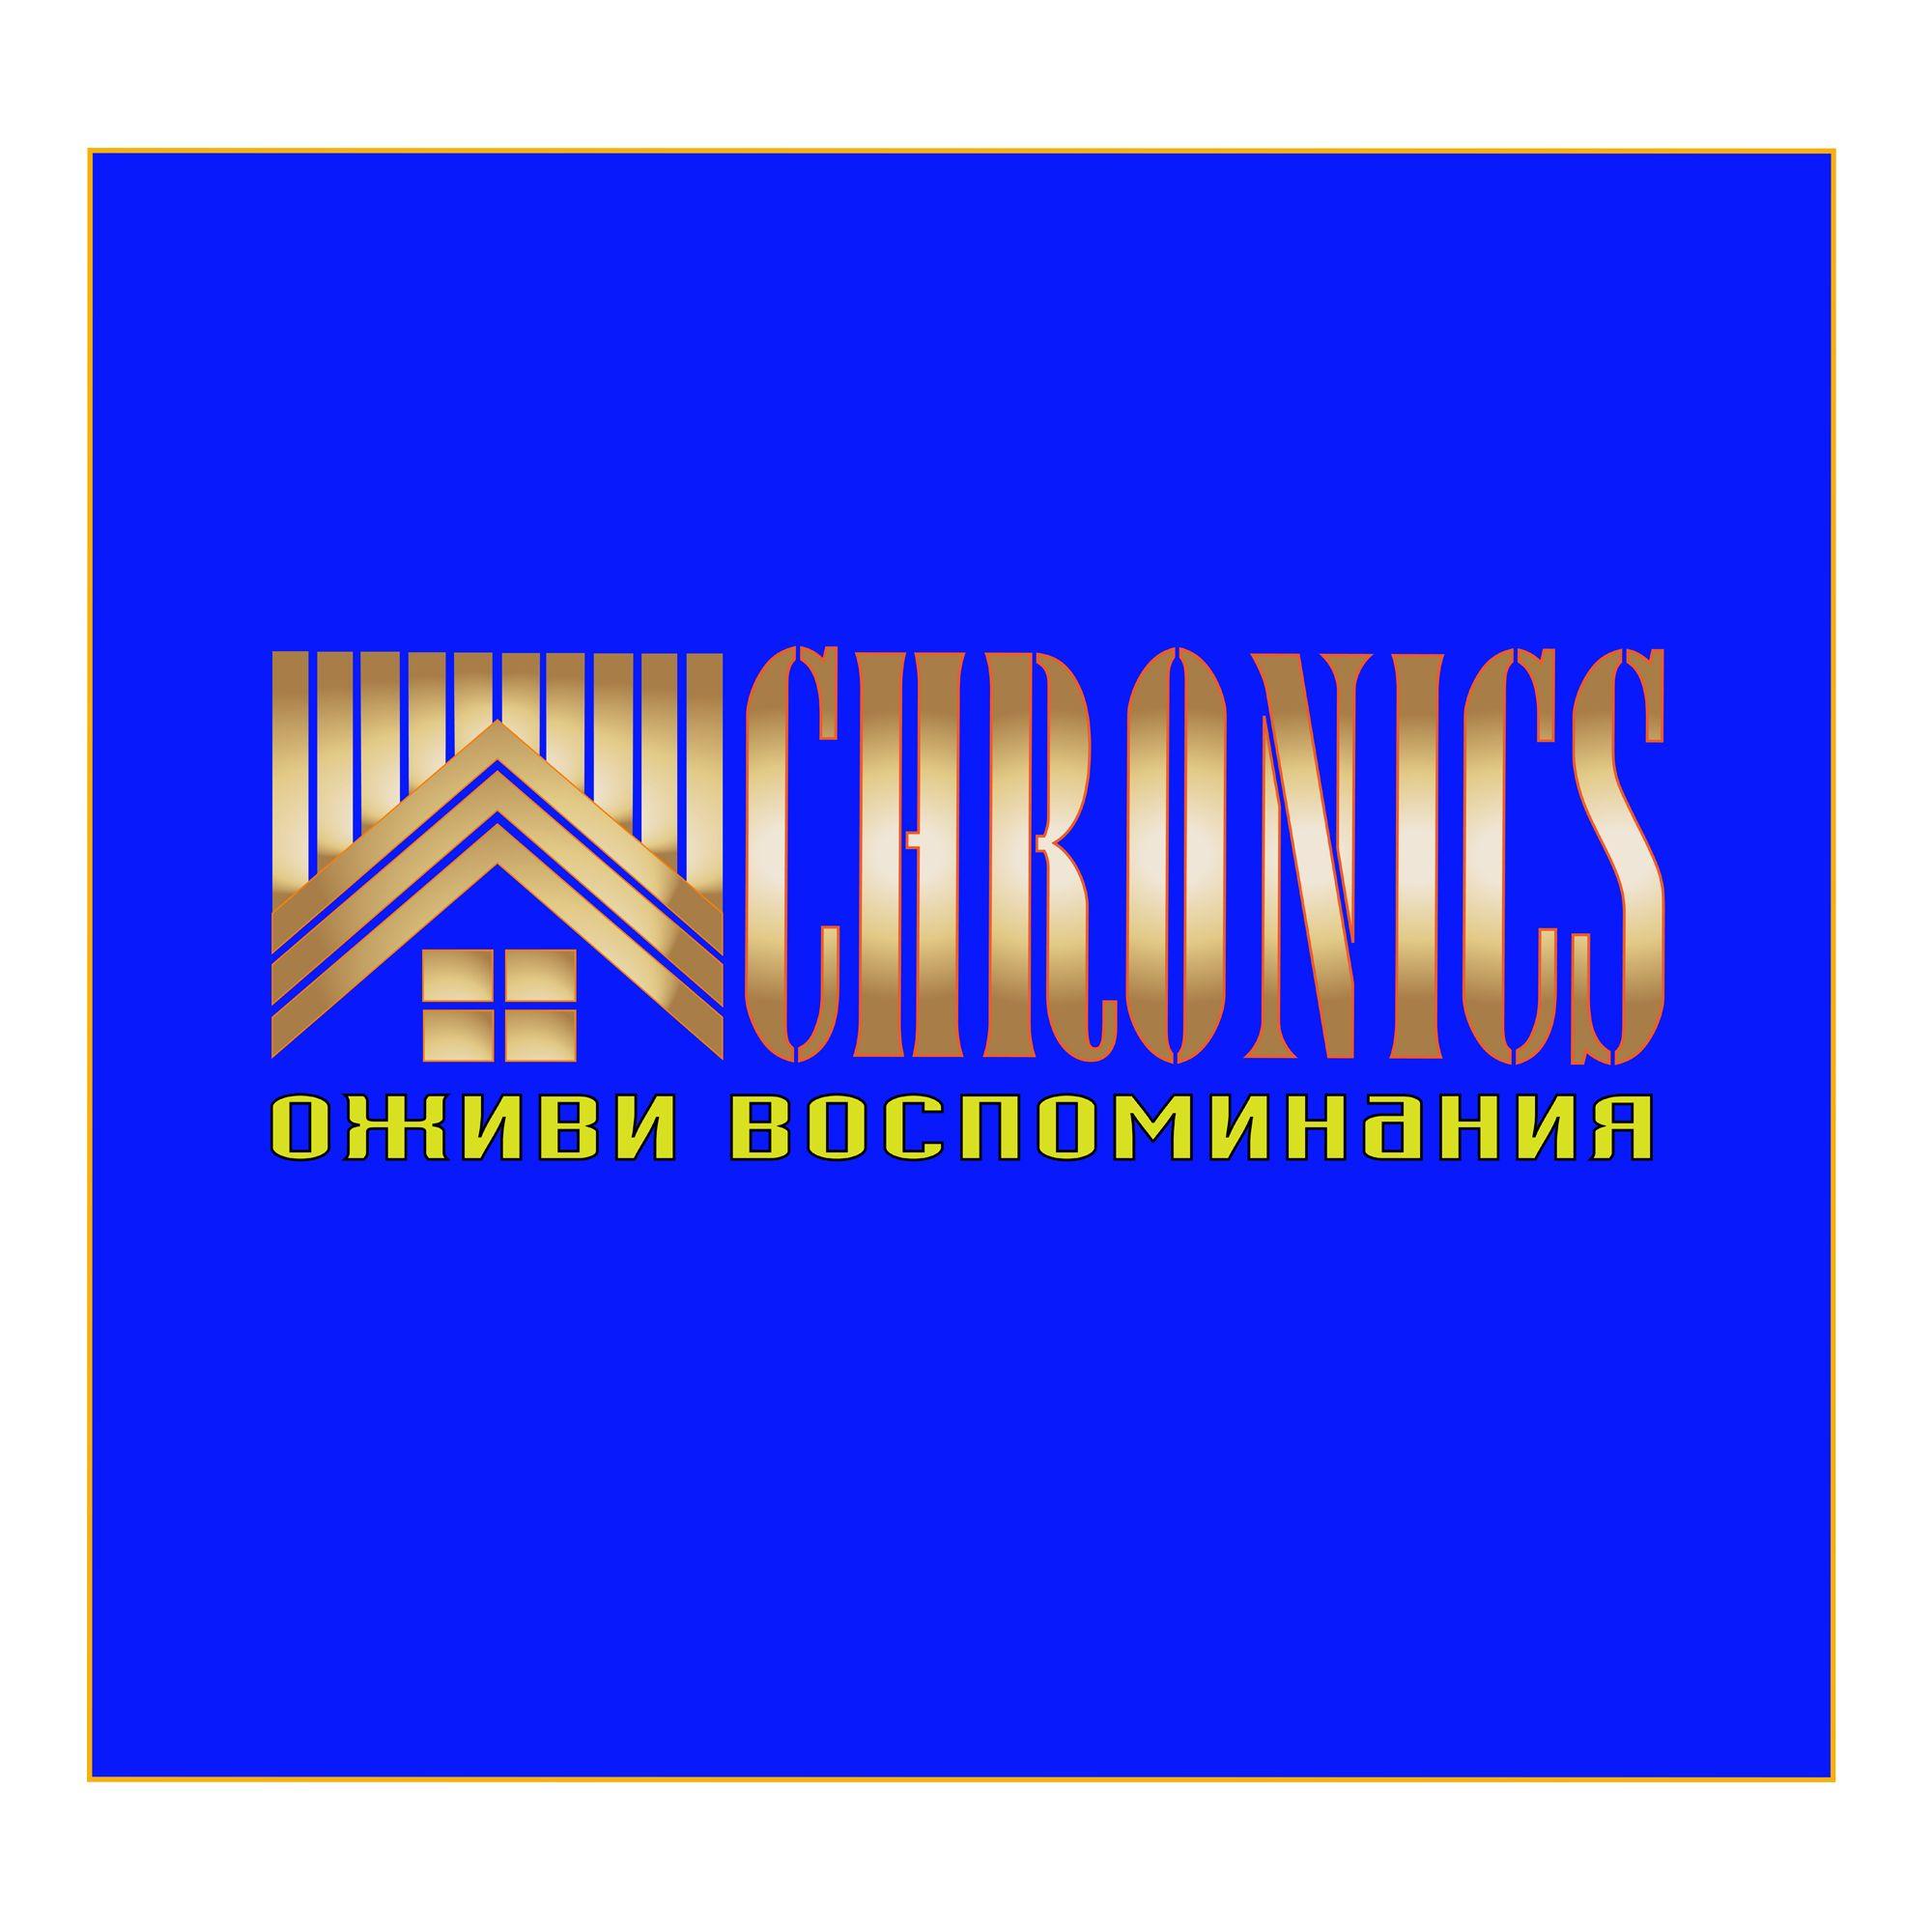 Логотип сервиса Chronics - дизайнер atmannn